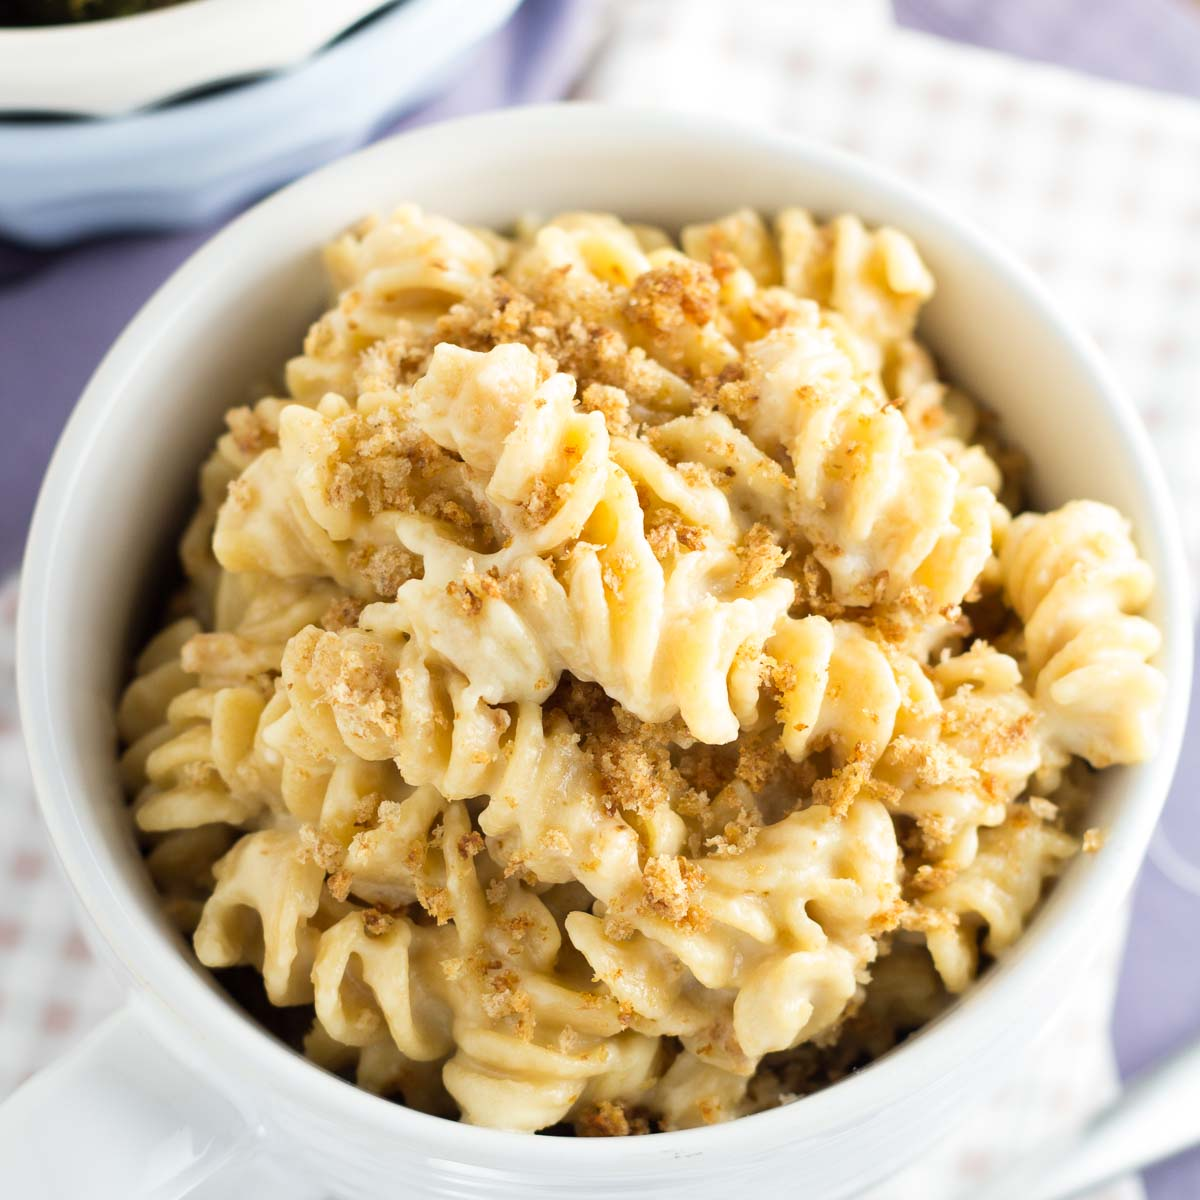 Whole grain macaroni and cheese